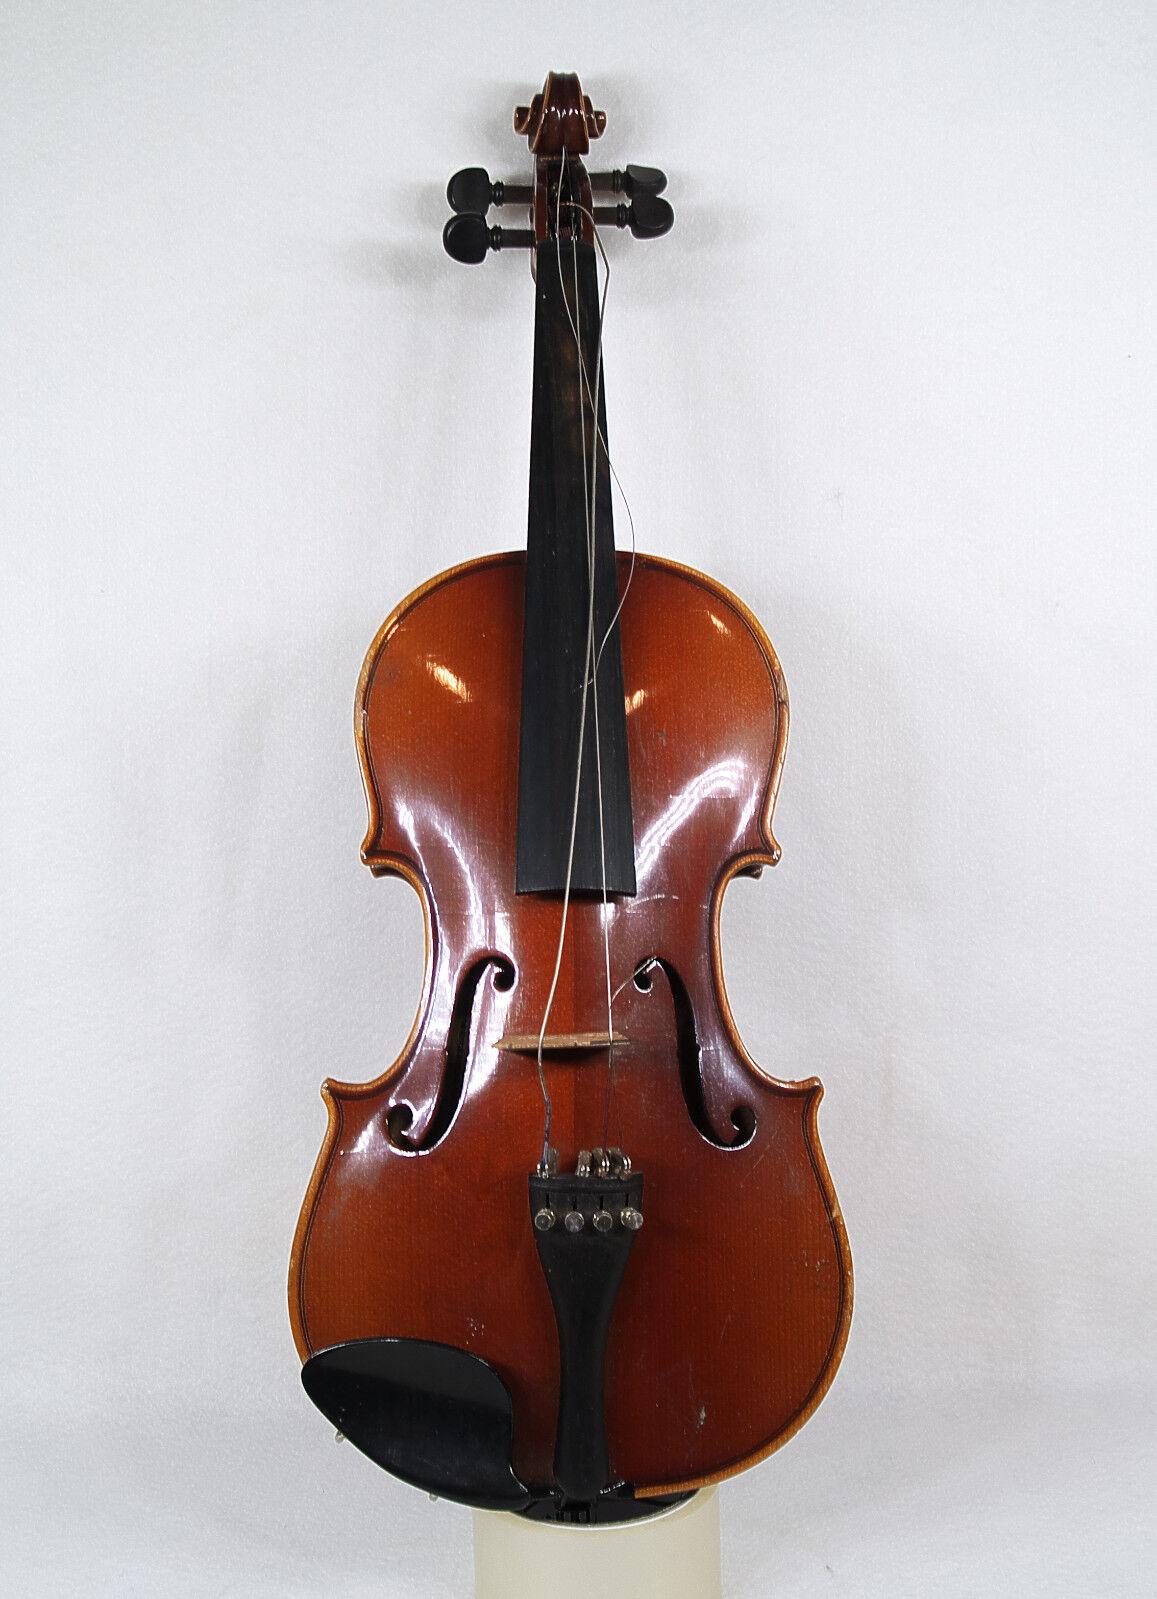 Andrew Schroetter Model 320-14 S -549 Violin Germany 1986